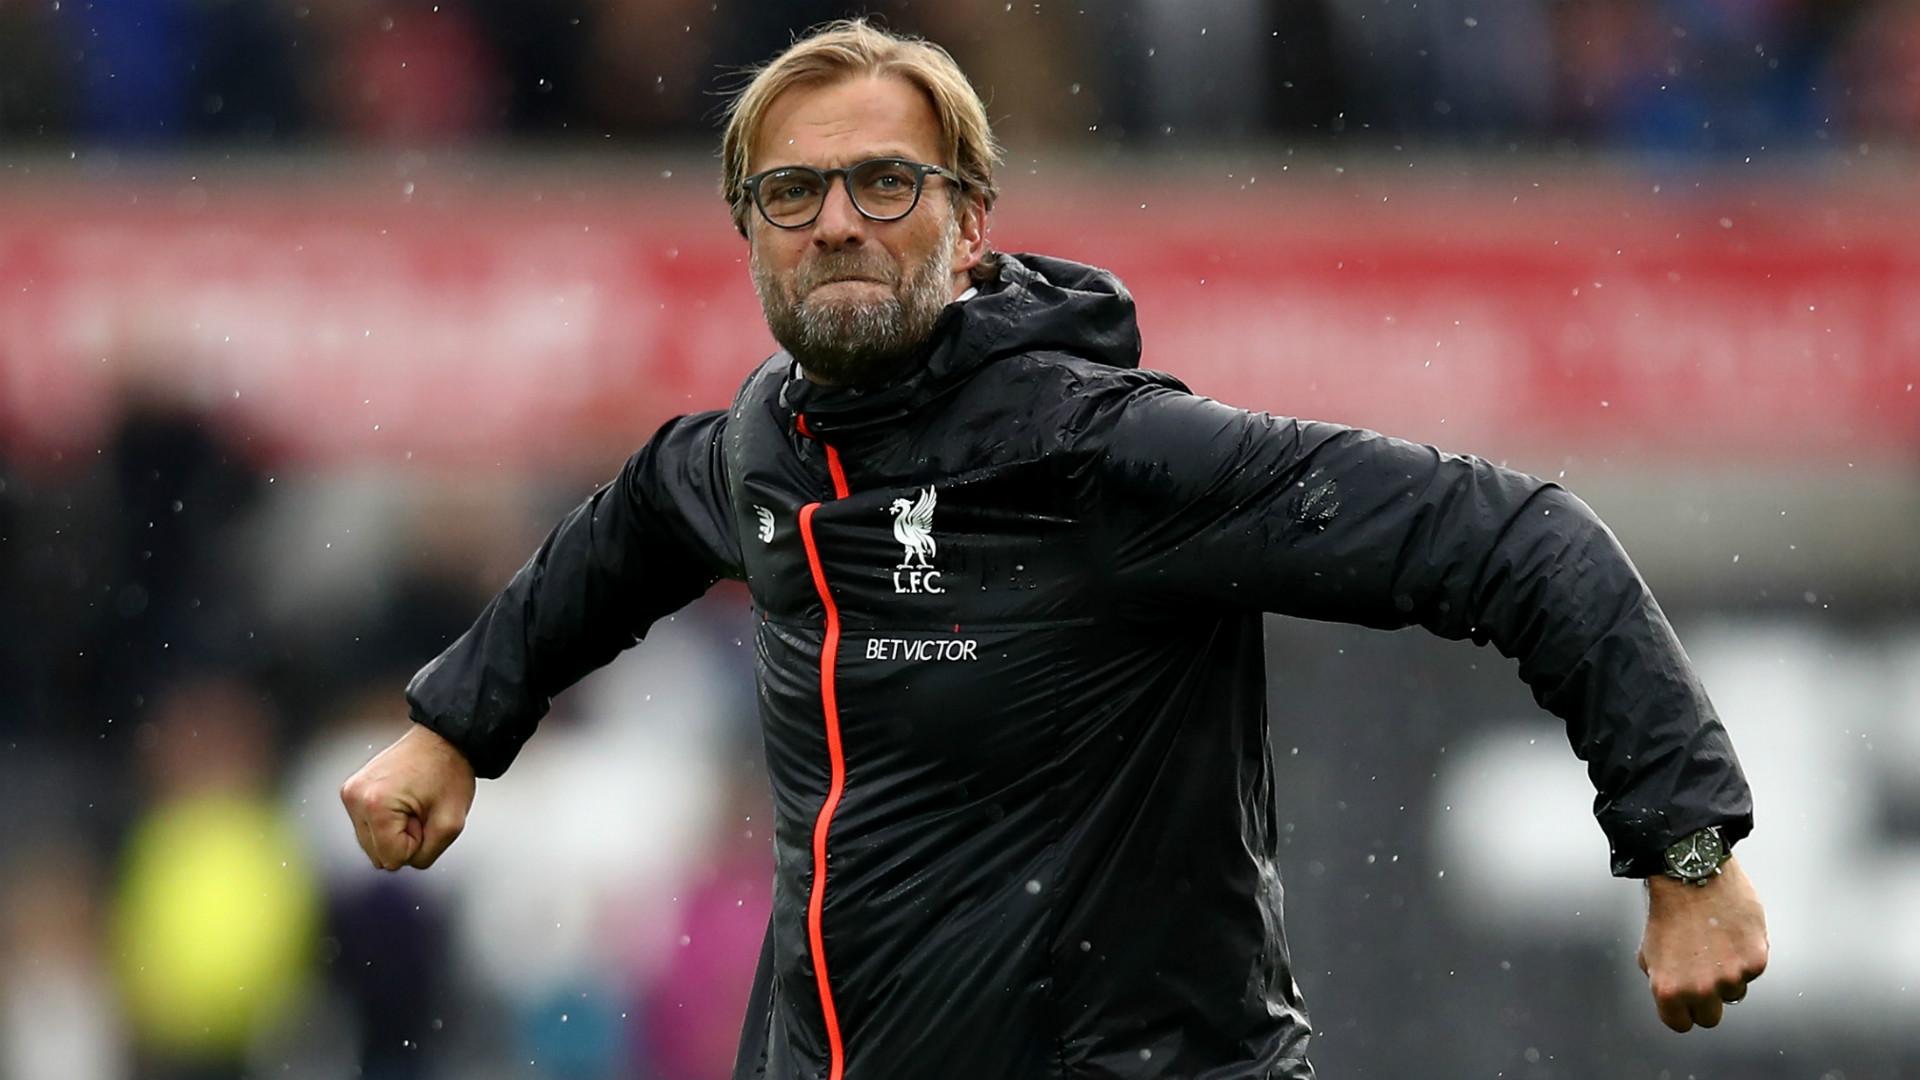 HD Jurgen Klopp Liverpool